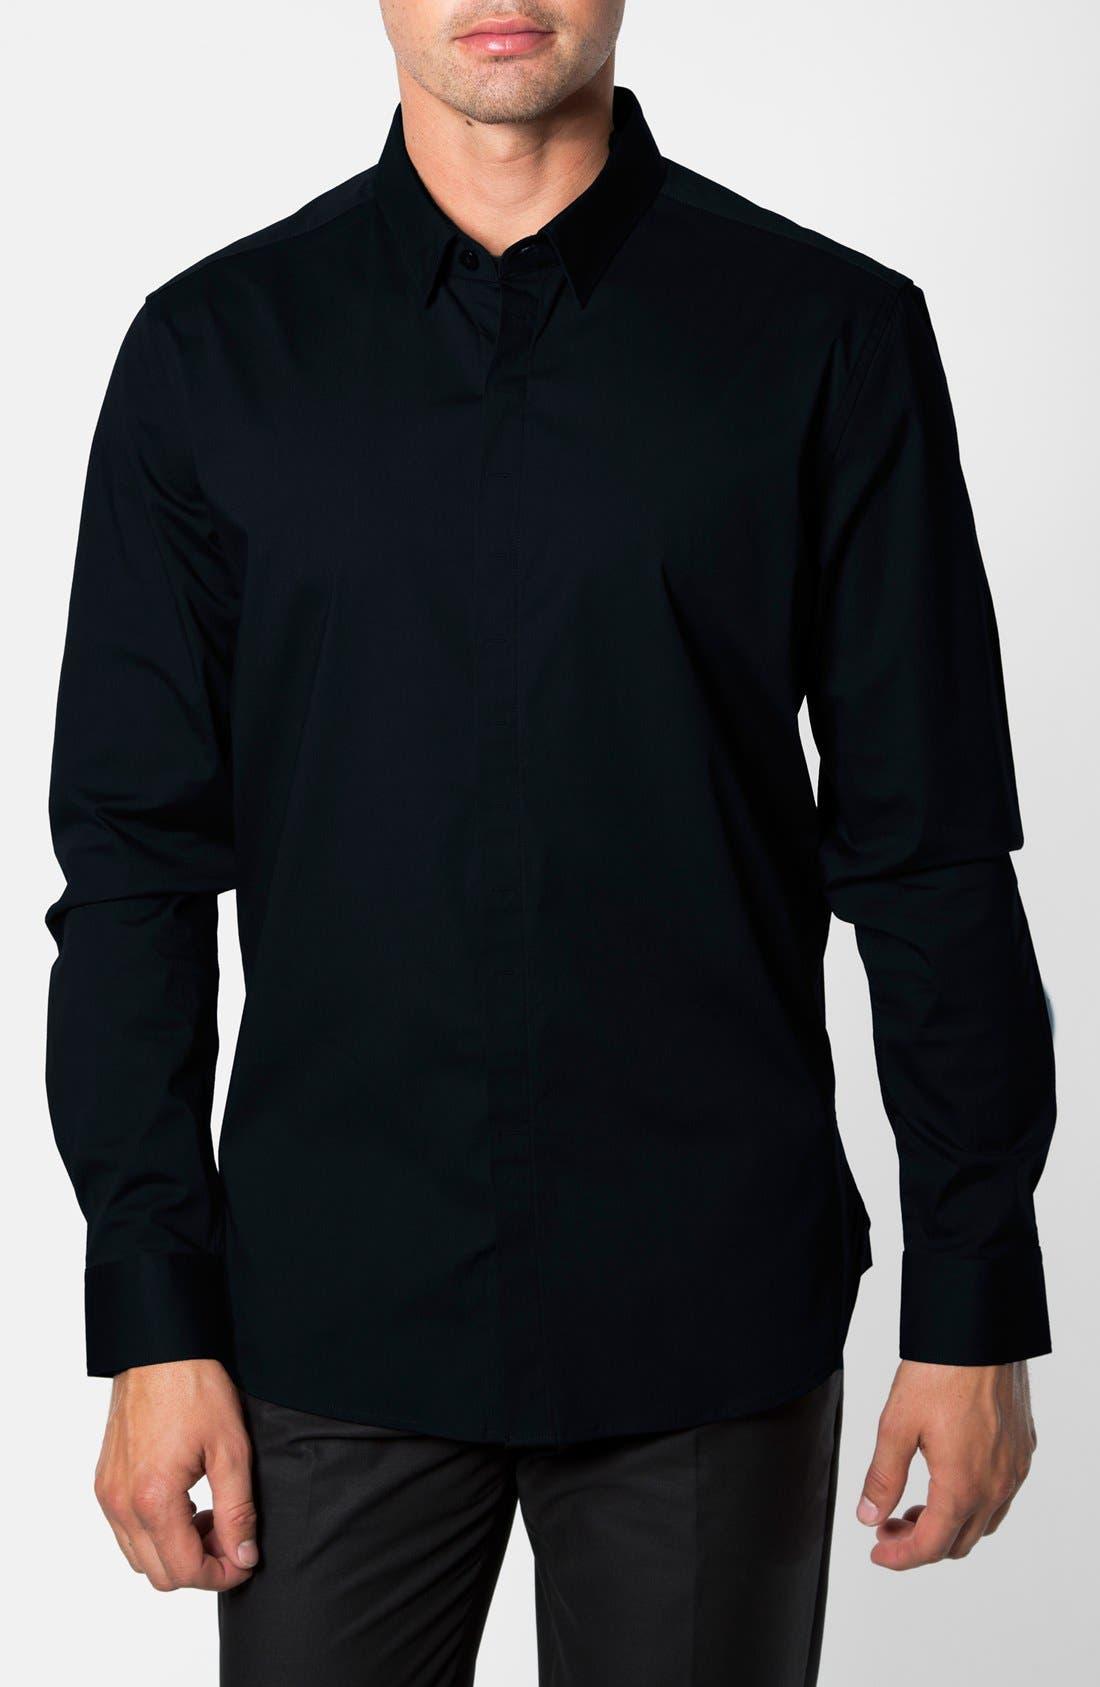 7 Diamonds 'Peace Train' Trim Fit Woven Shirt